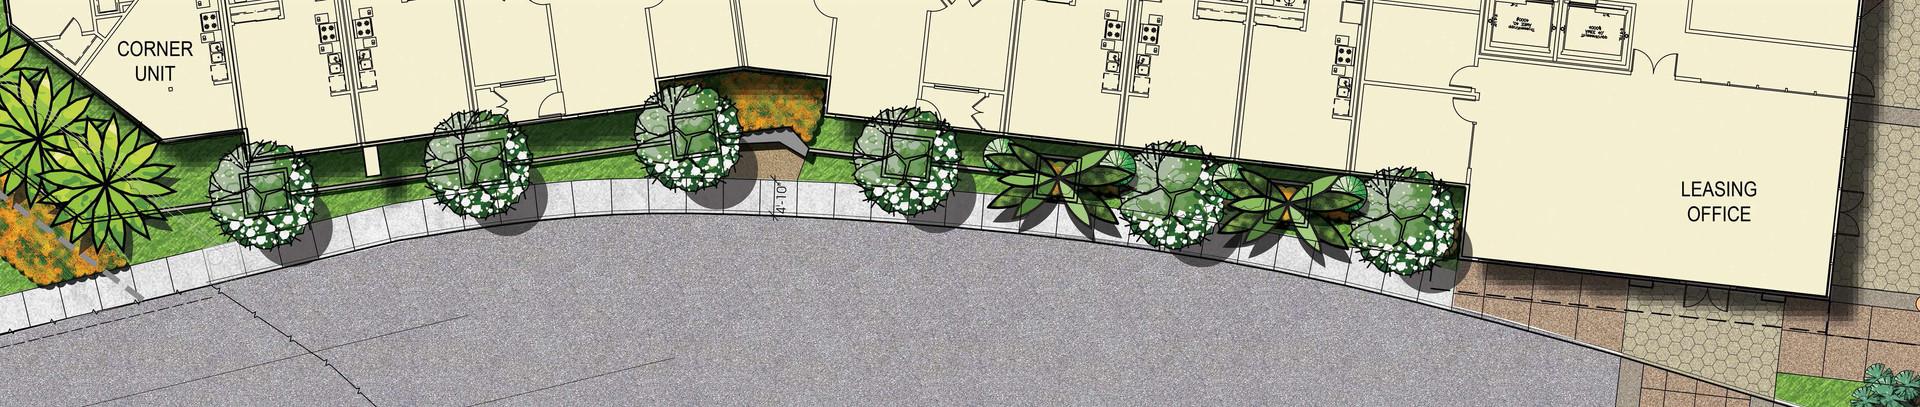 North County Plaza Street Edge  Enlargement